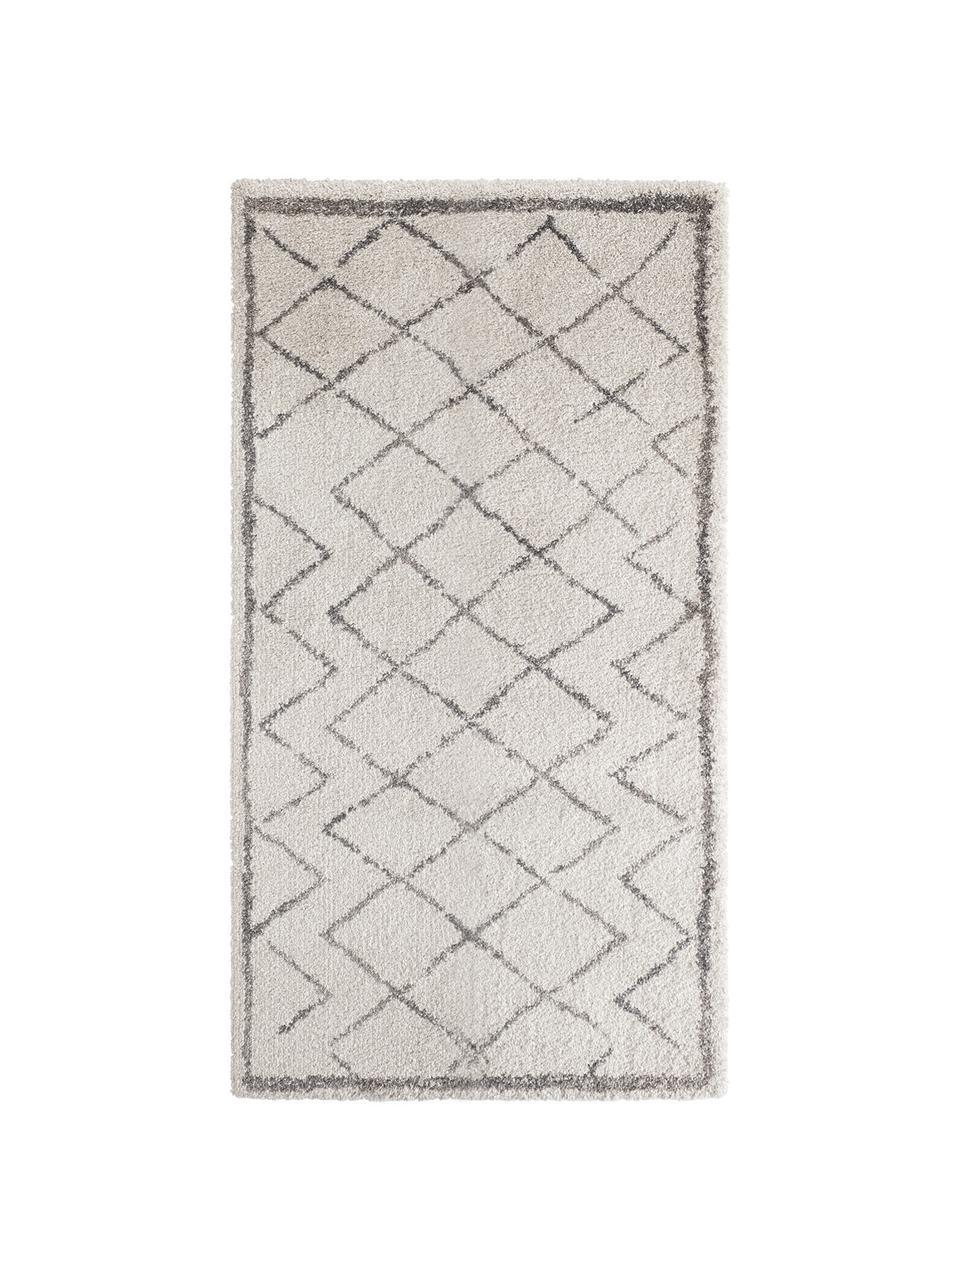 Hochflor-Teppich Luna Diamond mit Rautenmuster, Grau/Creme, Flor: 100% Polypropylen, Creme, Grau, B 80 x L 150 cm (Größe XS)